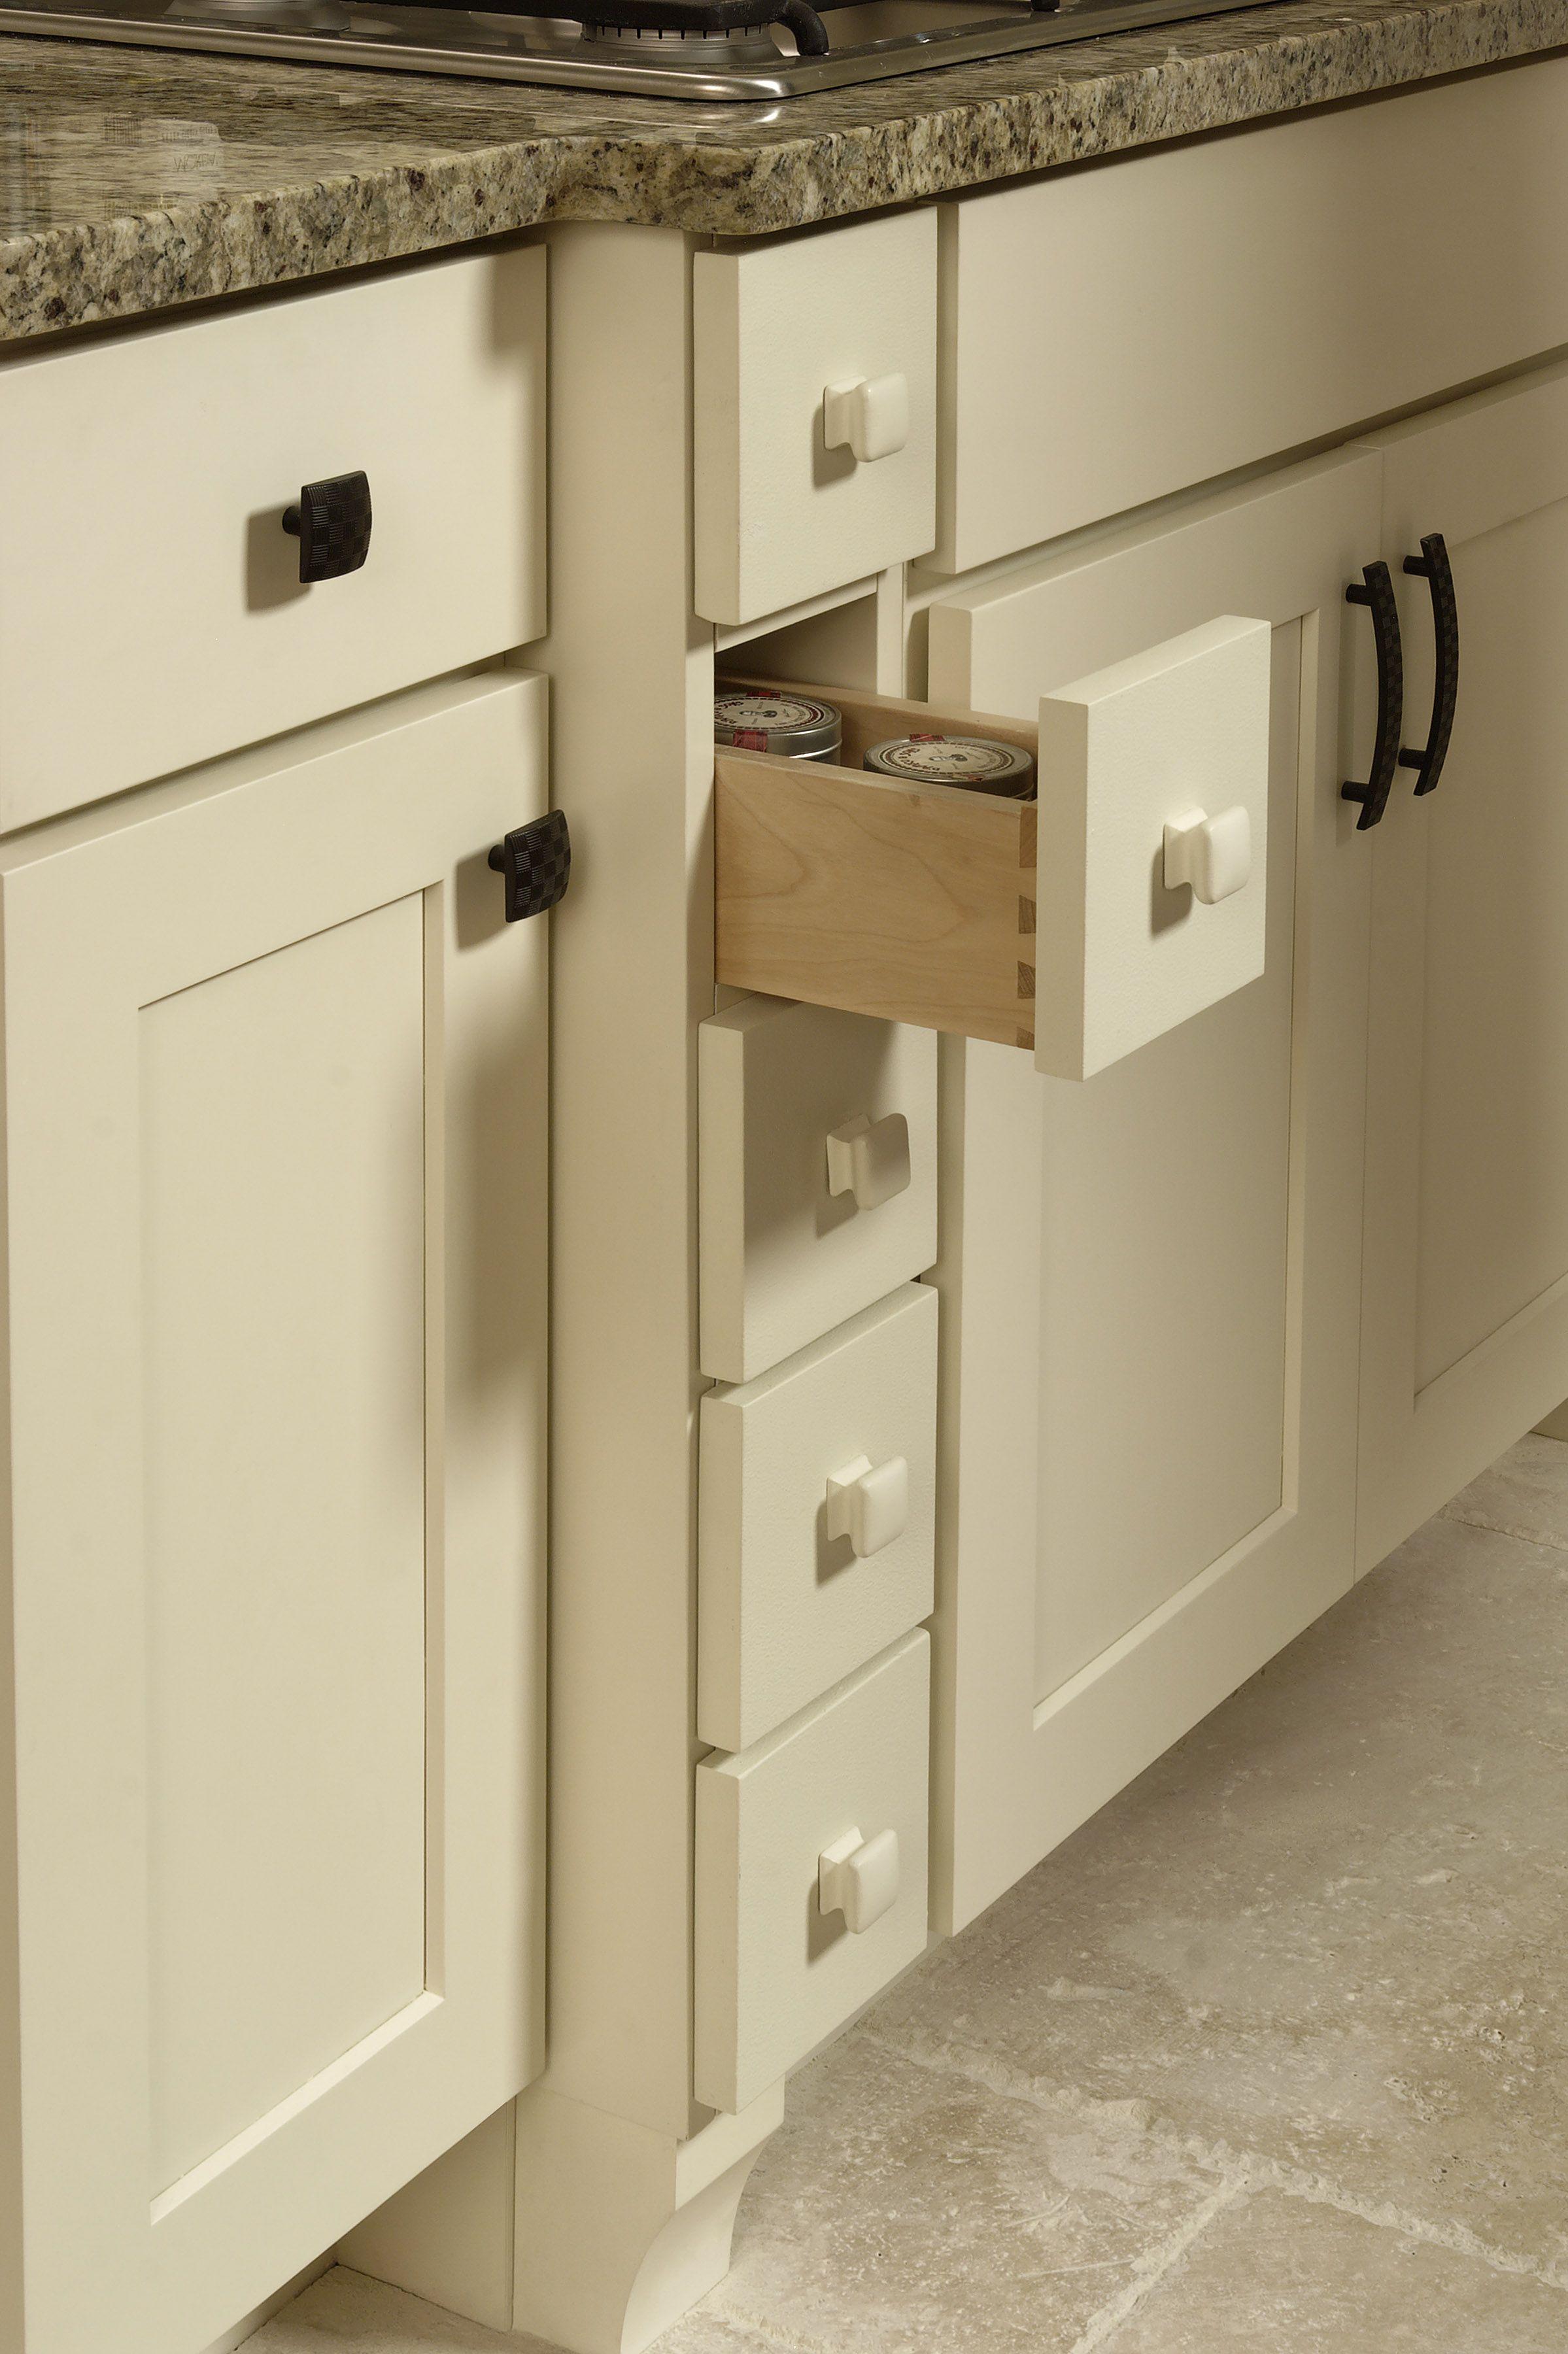 21 Wonderful Kitchen Cabinets Doors That Will Blow Your Mind Contemporary Kitchen Cabinets Kitchen Cabinet Doors Kitchen Cabinet Storage